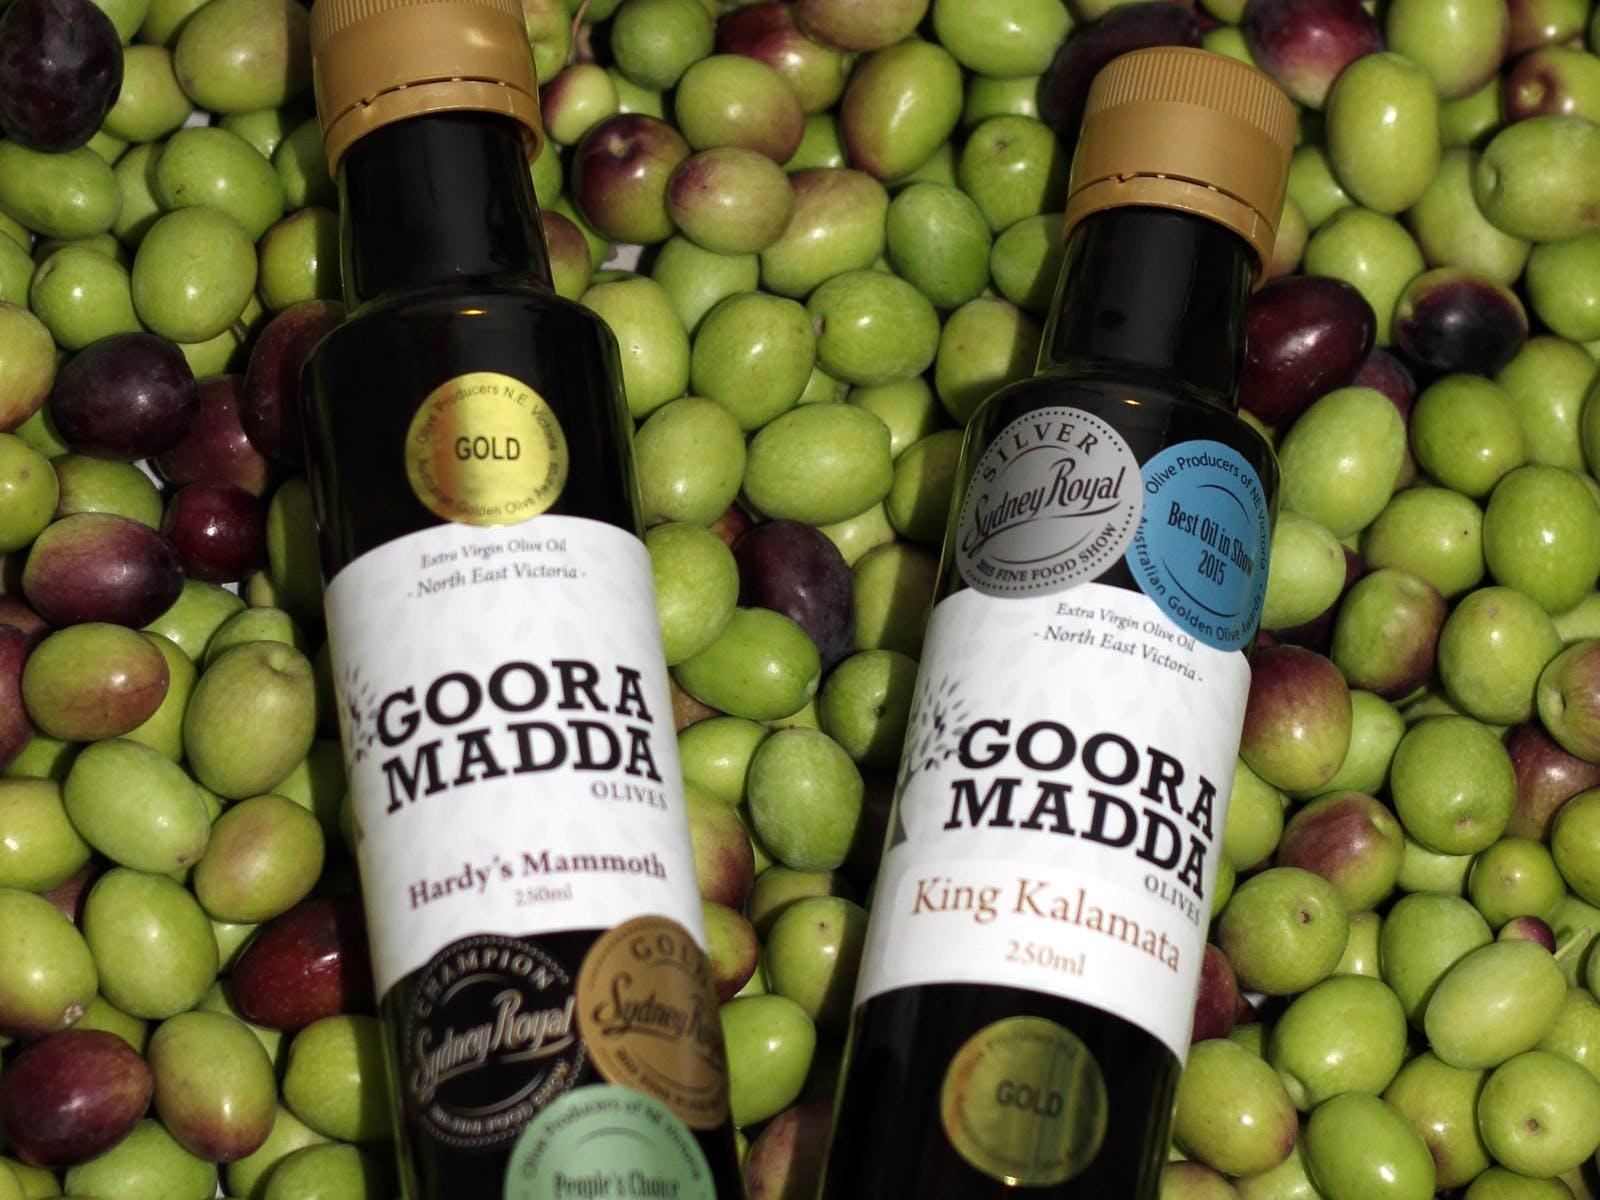 Gooramadda Olives Winning Oils - locally and internationally